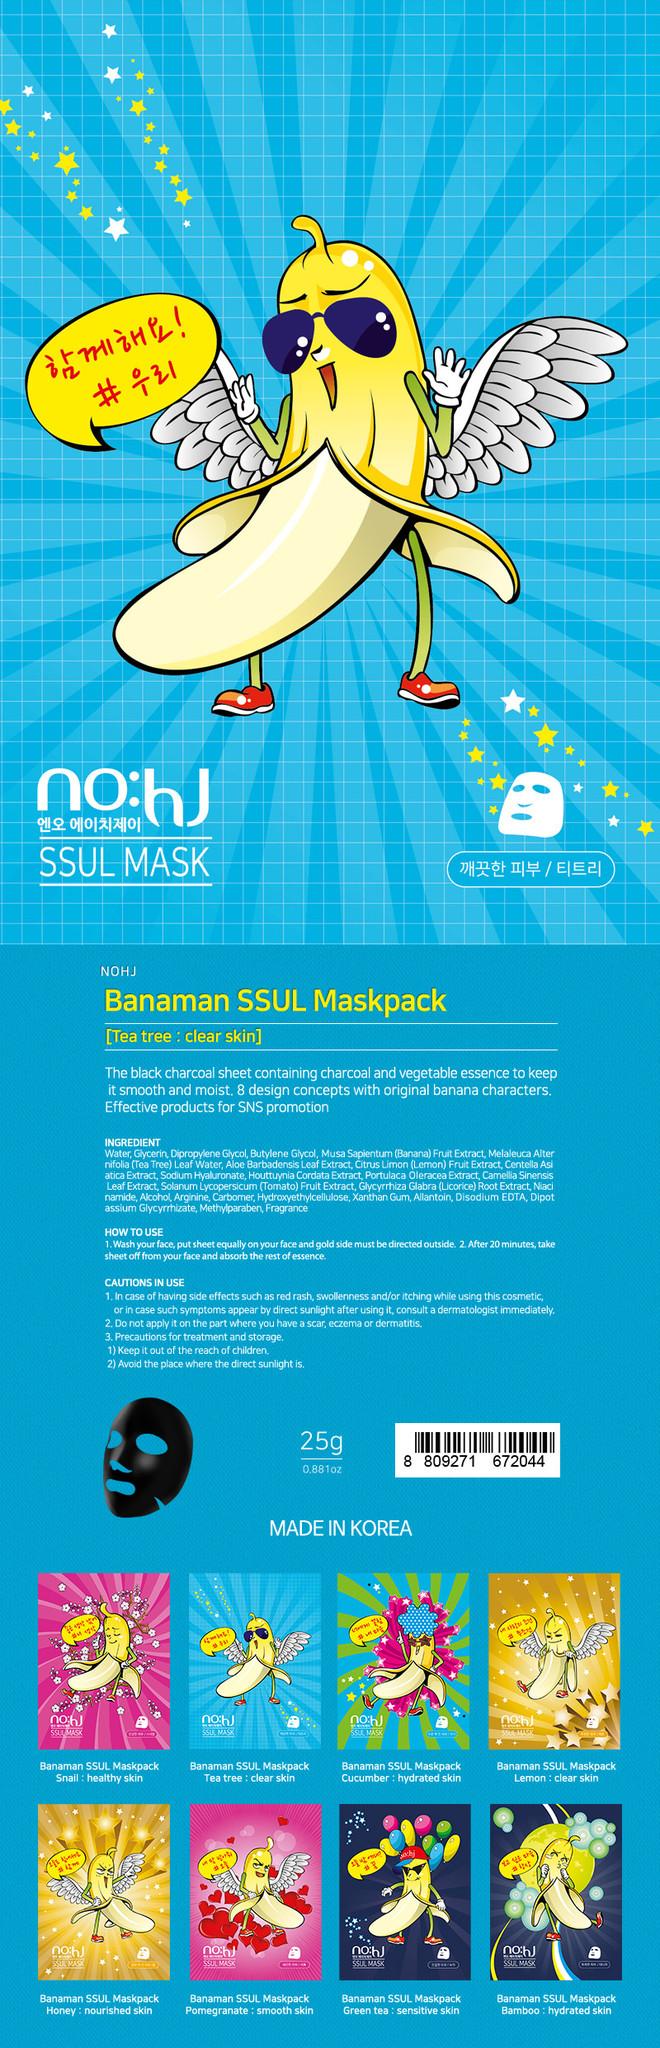 Banana SSUL Maskpack [Tea tree]-2